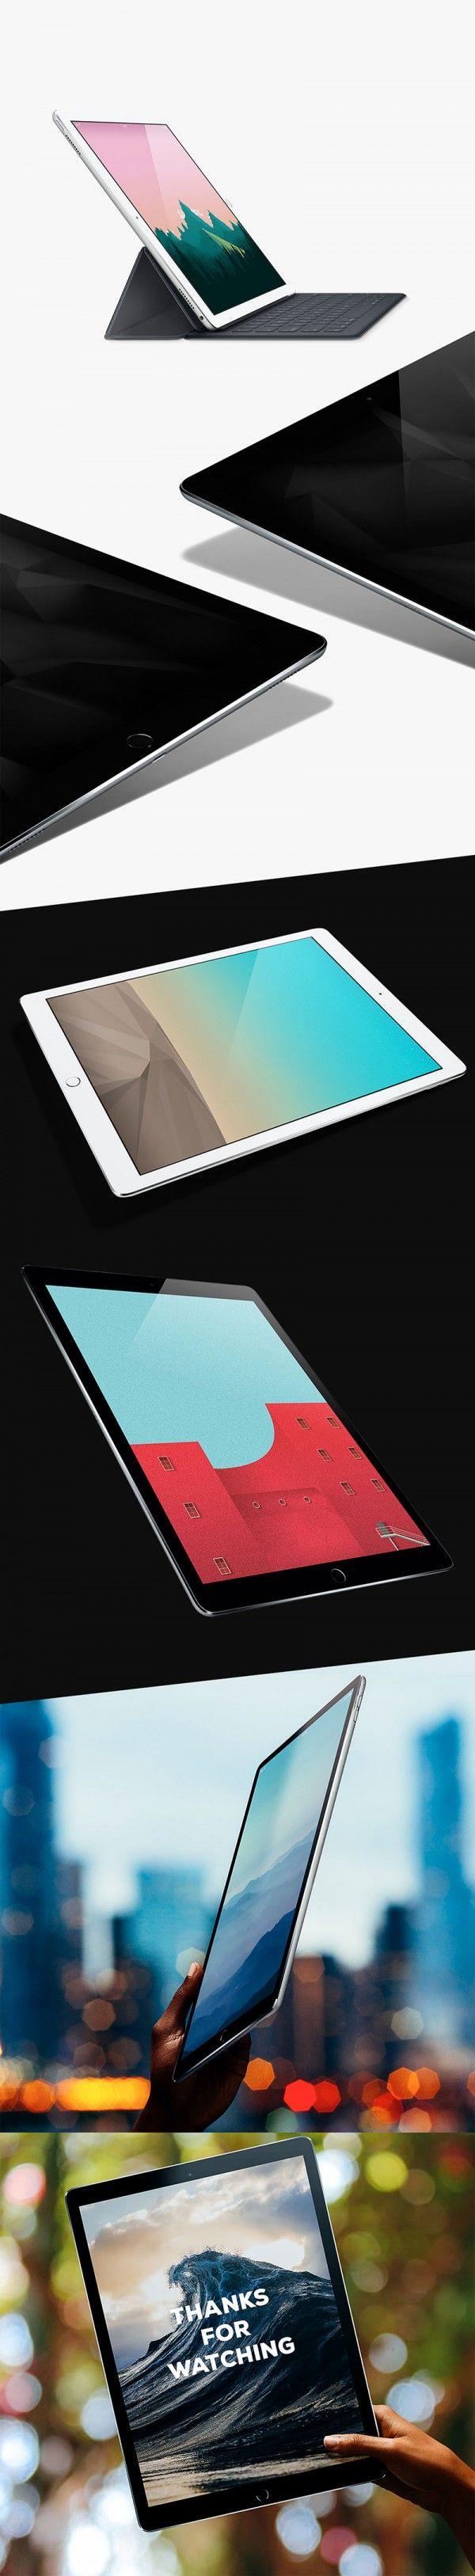 6 poster design photo mockups 57079 - Ipad Pro Mockups Free